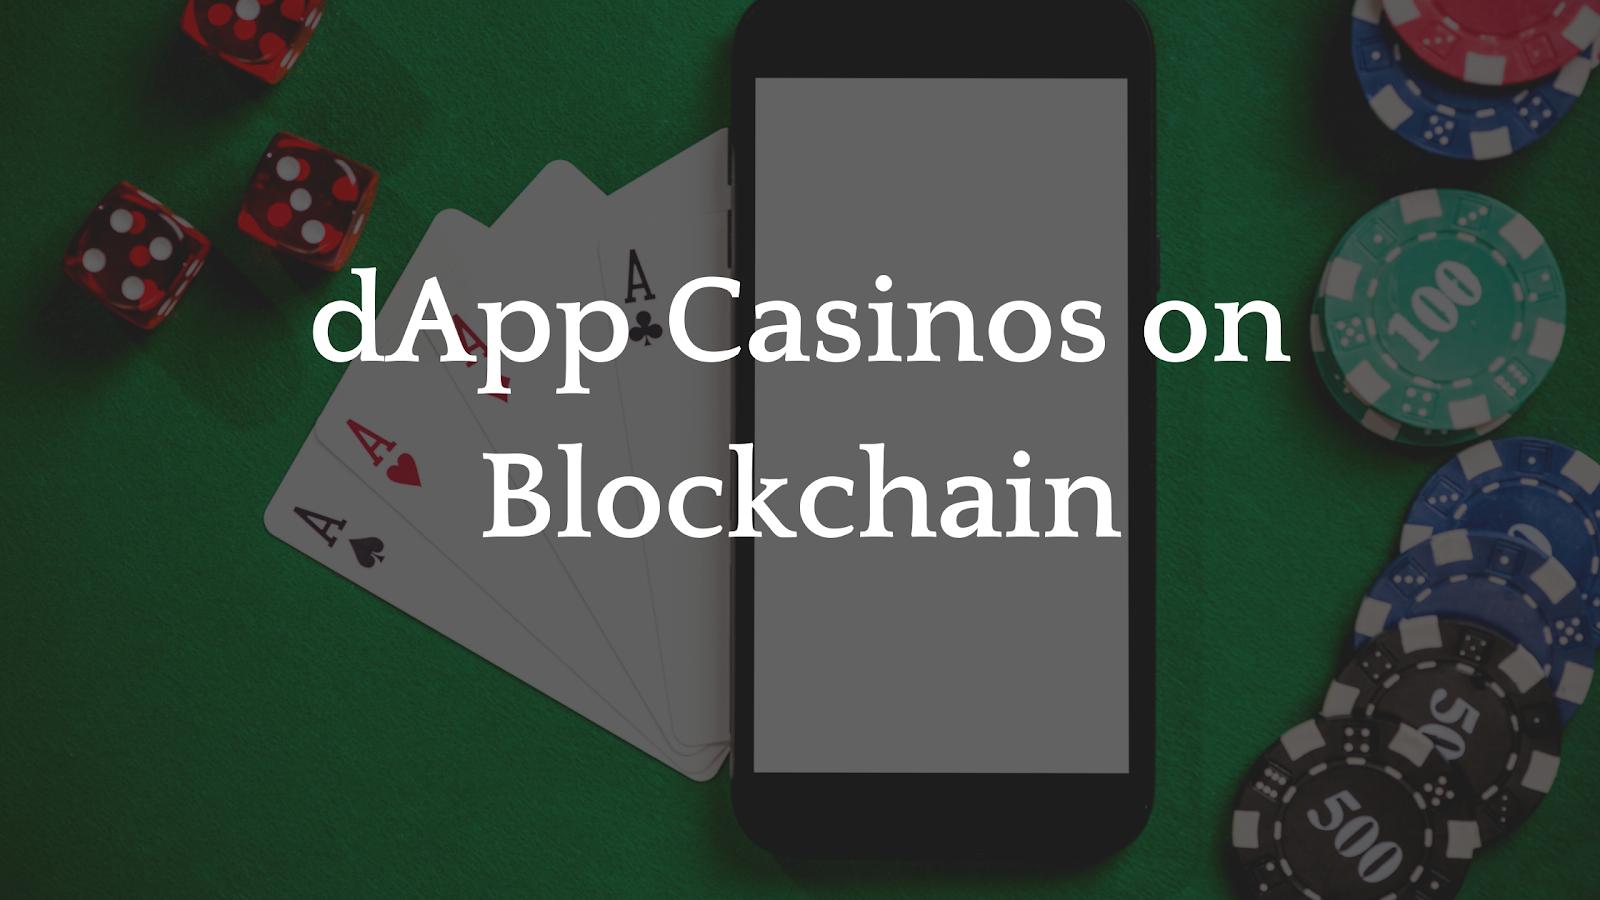 dApp Casinos on Blockchain